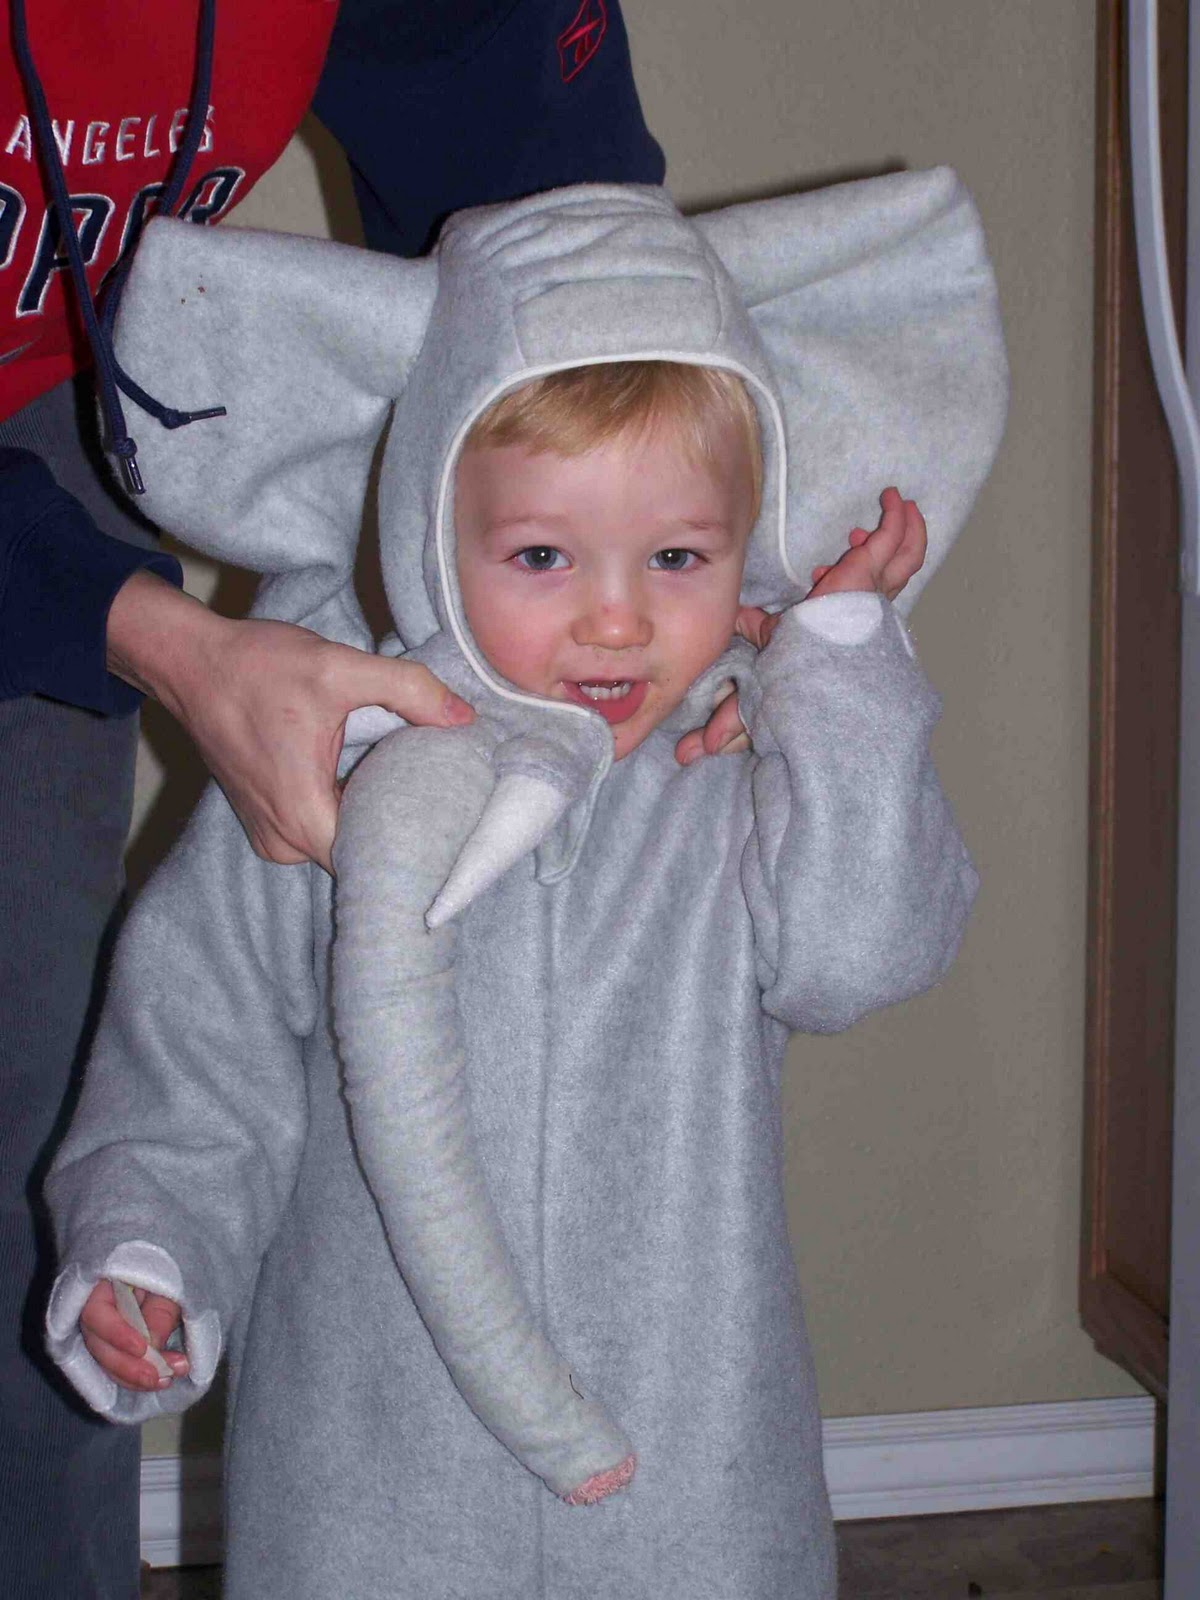 mademe. shared with you.: halloween costume: elephant